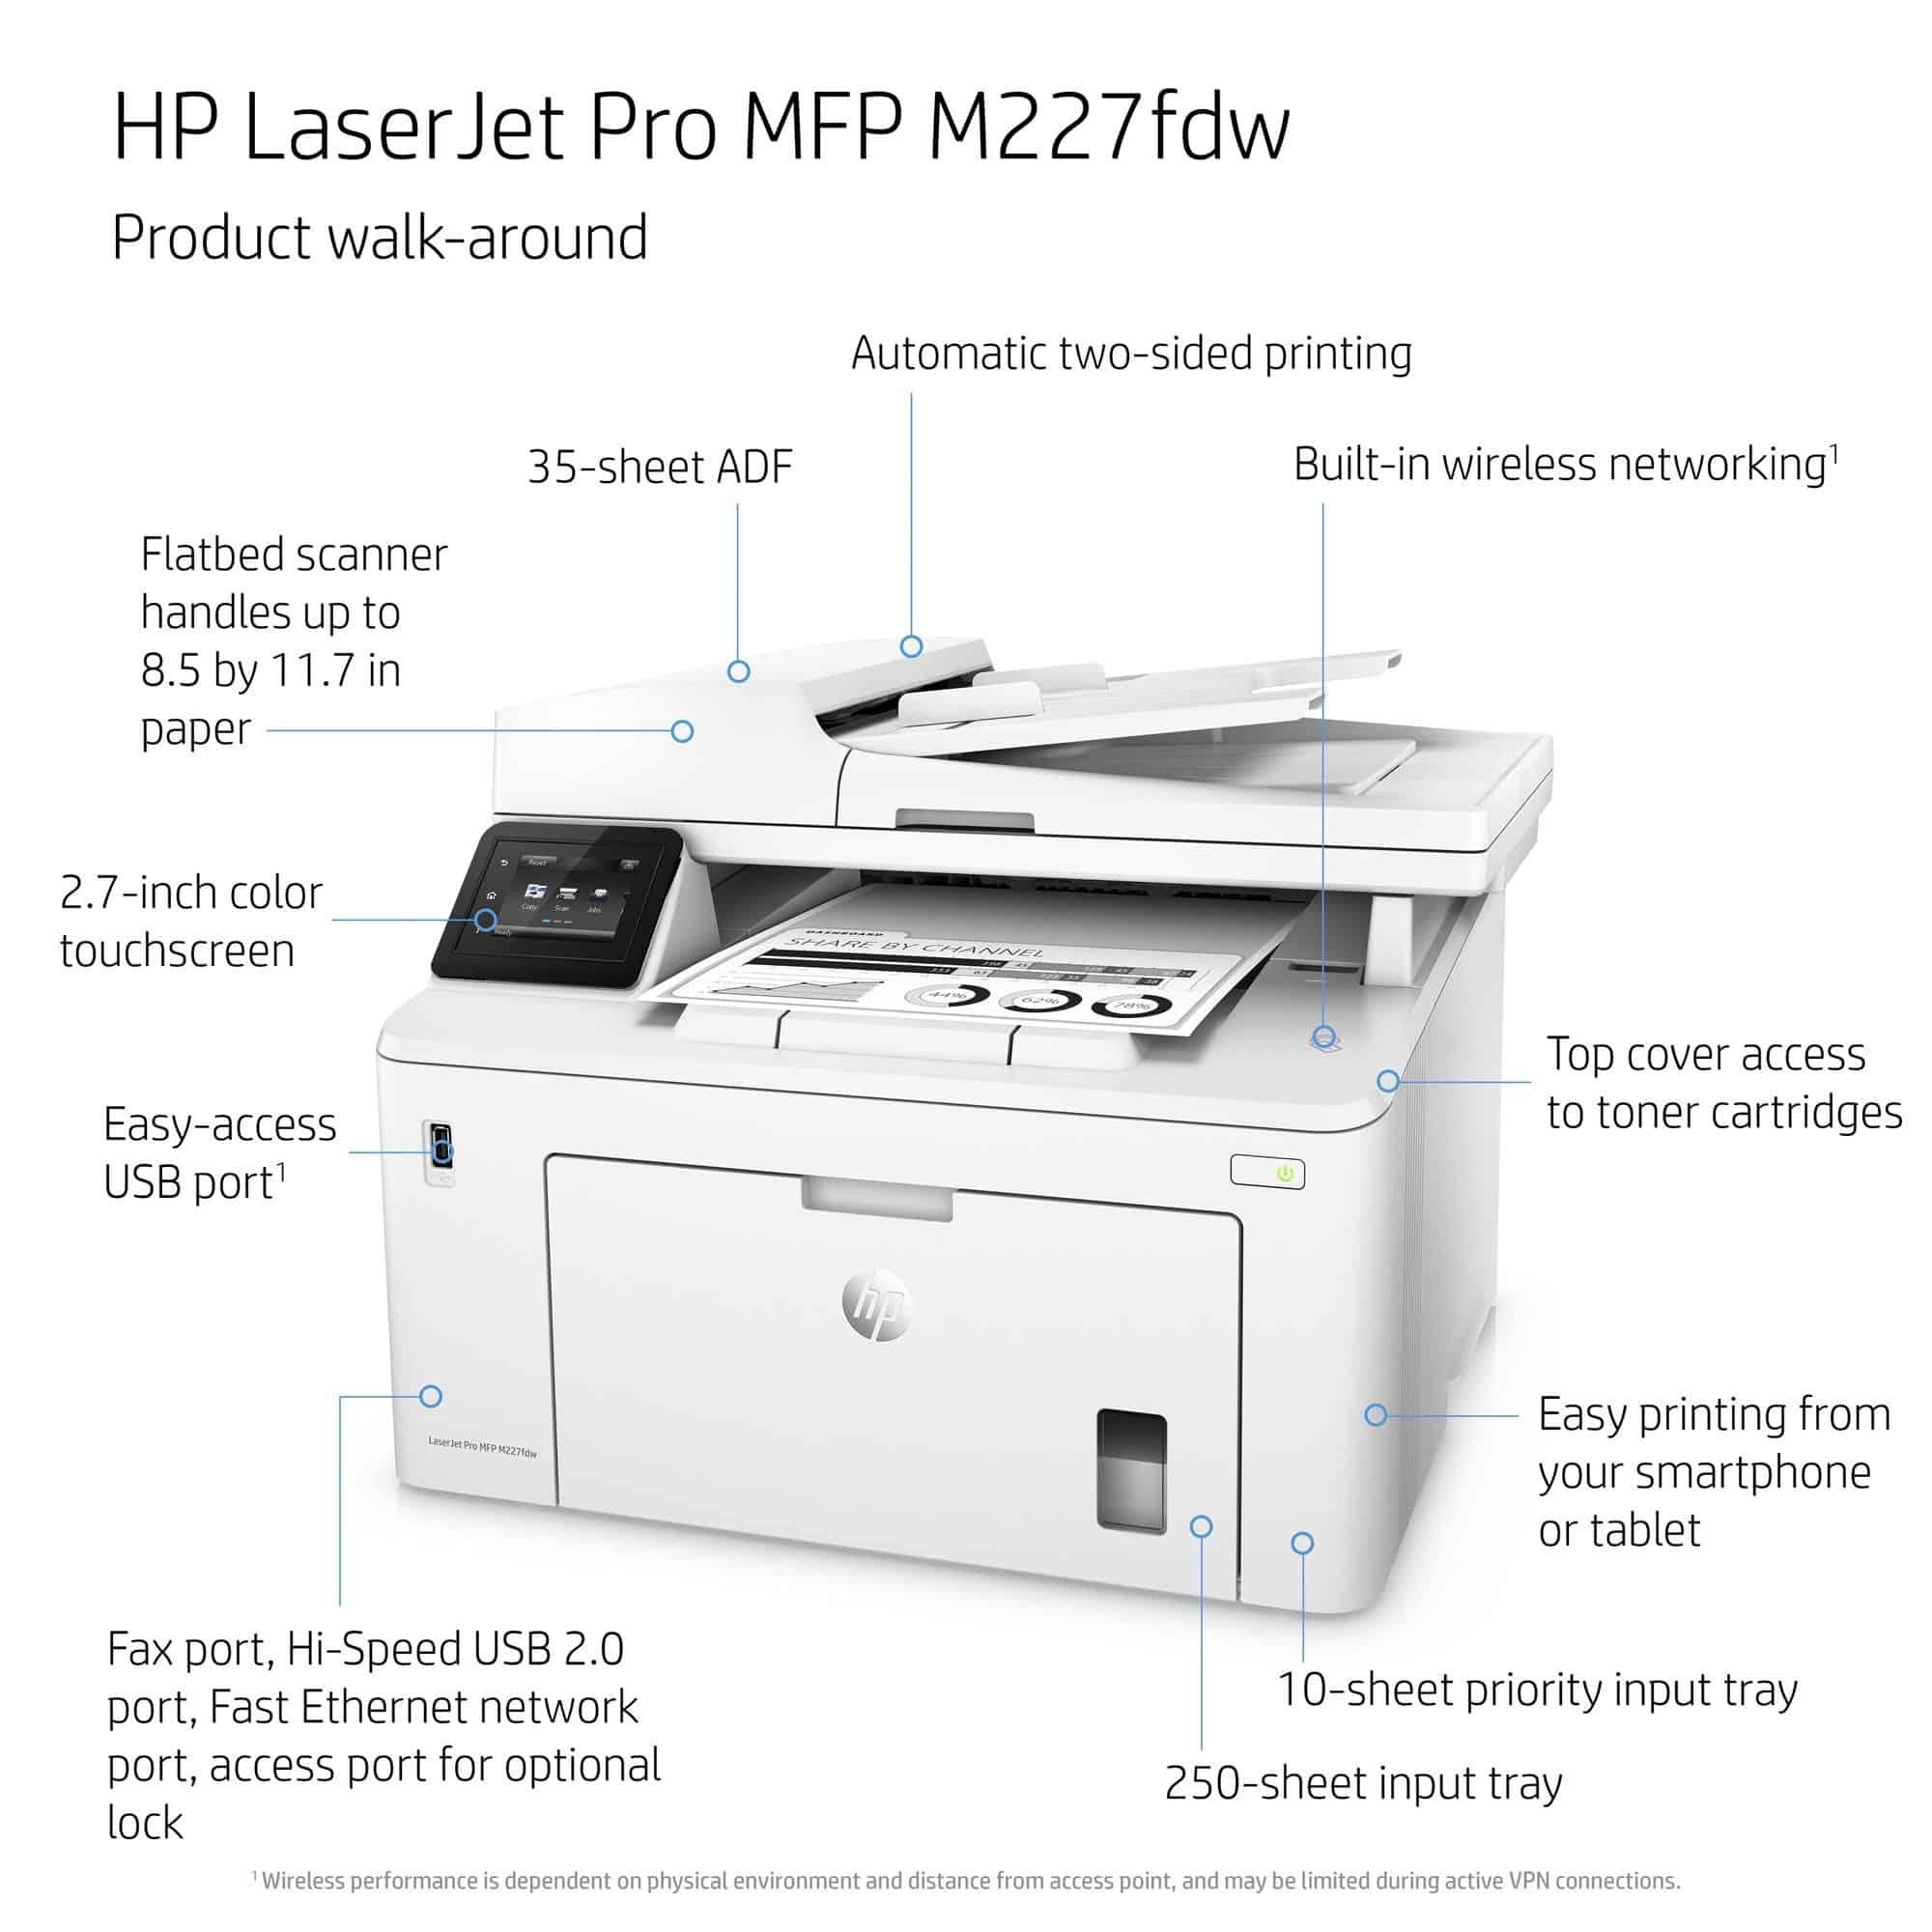 amazon HP LaserJet Pro MFP M227fdw reviews HP LaserJet Pro MFP M227fdw on amazon newest HP LaserJet Pro MFP M227fdw prices of HP LaserJet Pro MFP M227fdw HP LaserJet Pro MFP M227fdw deals best deals on HP LaserJet Pro MFP M227fdw buying a HP LaserJet Pro MFP M227fdw lastest HP LaserJet Pro MFP M227fdw what is a HP LaserJet Pro MFP M227fdw HP LaserJet Pro MFP M227fdw at amazon where to buy HP LaserJet Pro MFP M227fdw where can i you get a HP LaserJet Pro MFP M227fdw online purchase HP LaserJet Pro MFP M227fdw HP LaserJet Pro MFP M227fdw sale off HP LaserJet Pro MFP M227fdw discount cheapest HP LaserJet Pro MFP M227fdw HP LaserJet Pro MFP M227fdw for sale HP LaserJet Pro MFP M227fdw products HP LaserJet Pro MFP M227fdw tutorial HP LaserJet Pro MFP M227fdw specification HP LaserJet Pro MFP M227fdw features HP LaserJet Pro MFP M227fdw test HP LaserJet Pro MFP M227fdw series HP LaserJet Pro MFP M227fdw service manual HP LaserJet Pro MFP M227fdw instructions HP LaserJet Pro MFP M227fdw accessories hp laserjet pro mfp m227fdw printer hp laserjet pro mfp m227fdw driver hp laserjet pro mfp m227fdw (g3q75a) hp laserjet pro mfp m227fdw giá hp laserjet pro mfp m227fdw amazon hp laserjet pro mfp m227fdw brochure hp laserjet pro mfp m227fdw cartridge hp laserjet pro mfp m227fdw color hp laserjet pro mfp m227fdw datasheet hp laserjet pro mfp m227fdw drum hp laserjet pro mfp m227fdw driver for mac hp laserjet pro mfp m227fdw firmware hp laserjet pro mfp m227fdw g3q75a hp laserjet pro mfp m227fdw ink hp laserjet pro mfp m227fdw installation hp laserjet pro mfp m227fdw ink cartridge hp laserjet pro mfp m227fdw manual hp laserjet pro mfp m227fdw malaysia hp laserjet pro mfp m227fdw multifunction printer hp laserjet pro mfp m227fdw not printing hp laserjet pro mfp m227fdw review hp laserjet pro mfp m227fdw specs hp laserjet pro mfp m227fdw software hp laserjet pro mfp m227fdw scan to email hp laserjet pro mfp m227fdw scan to pdf hp laserjet pro mfp m227fdw singapore hp laserjet pro mfp